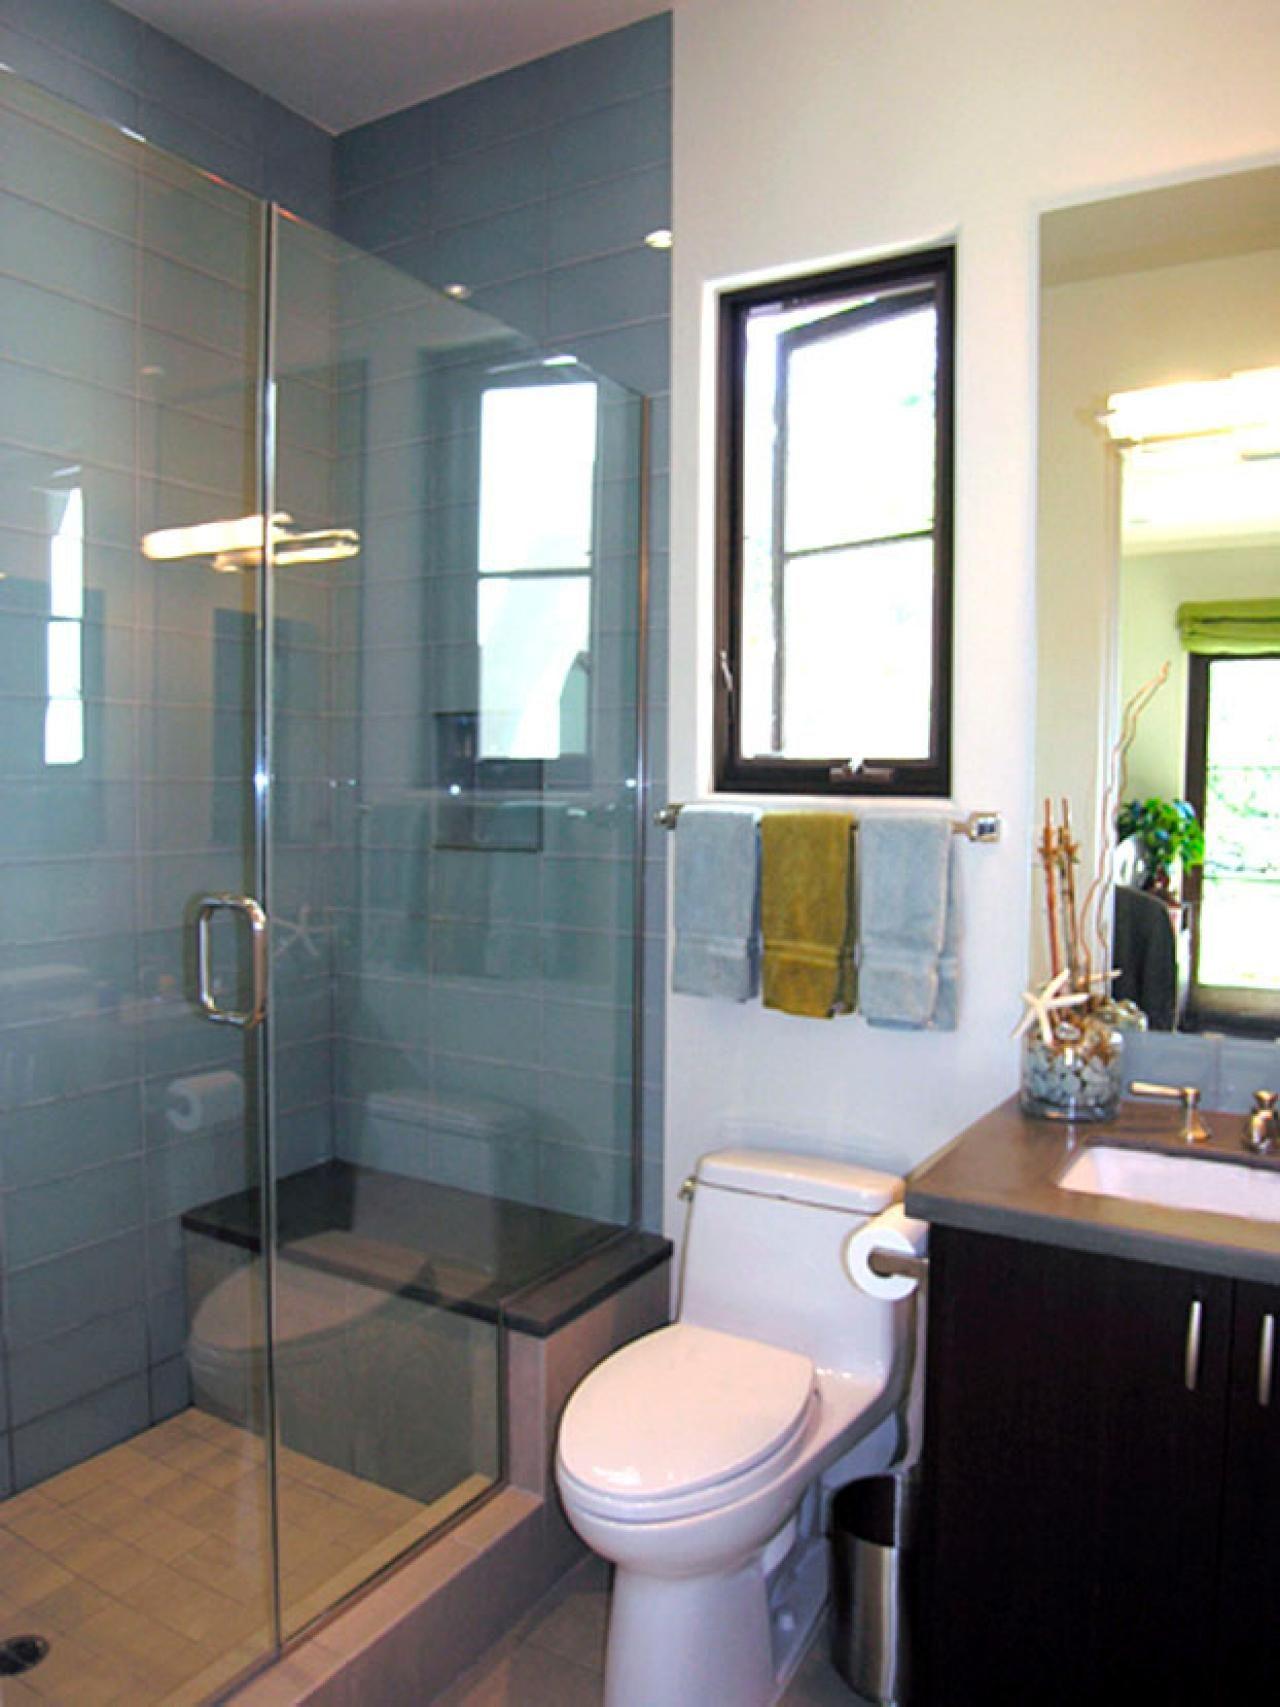 Three-Quarter Bathroom  Bathroom shower design, Bathroom layout